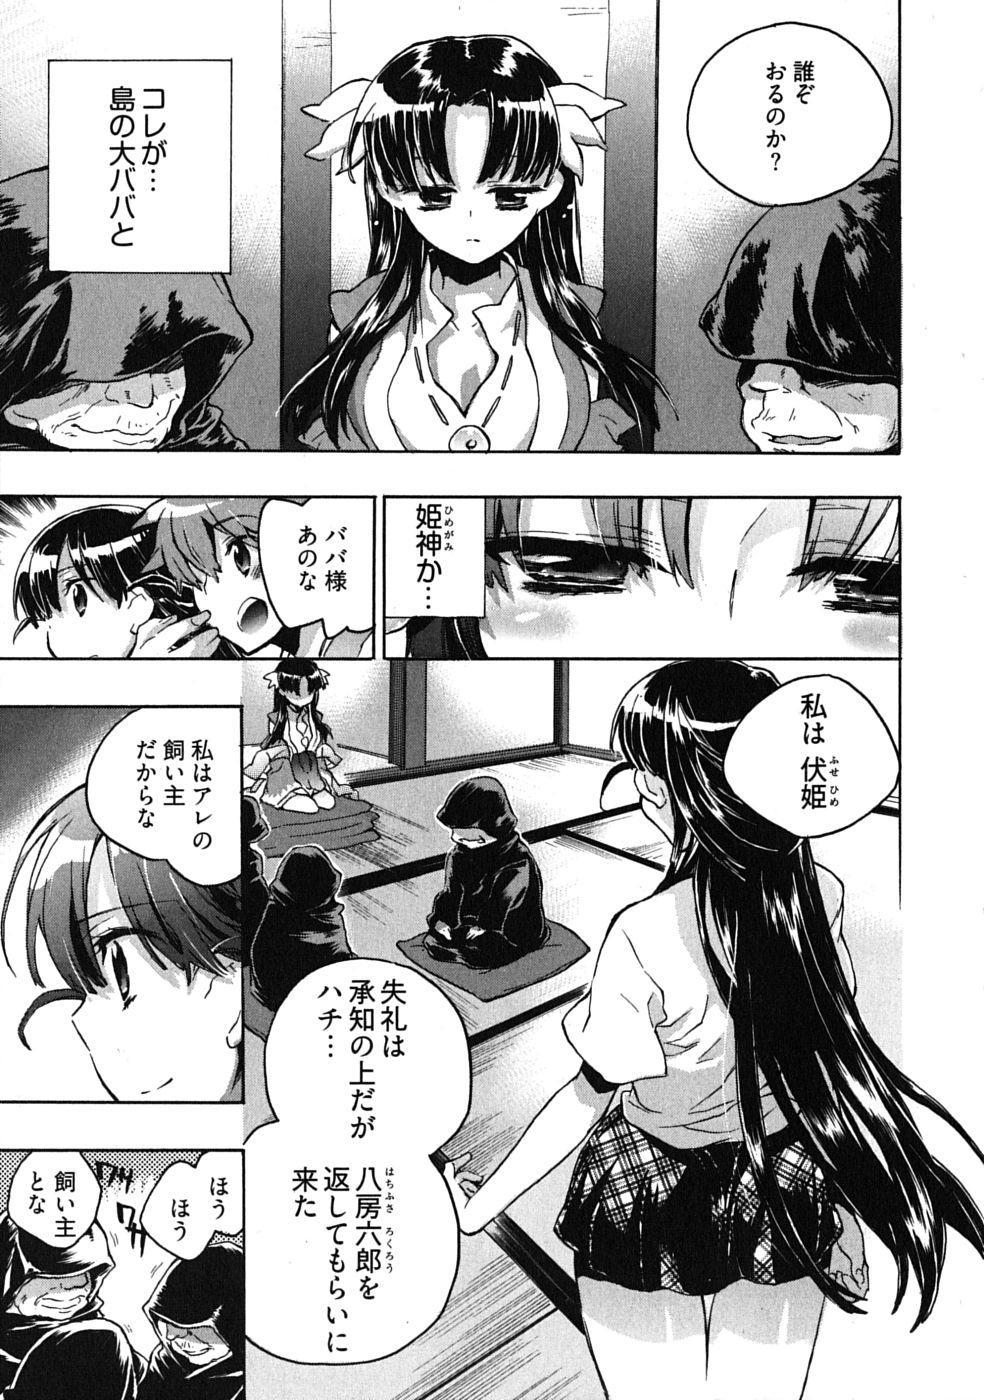 Omocha No Ohime-sama | La Princesse De Jouet Vol. 3 130